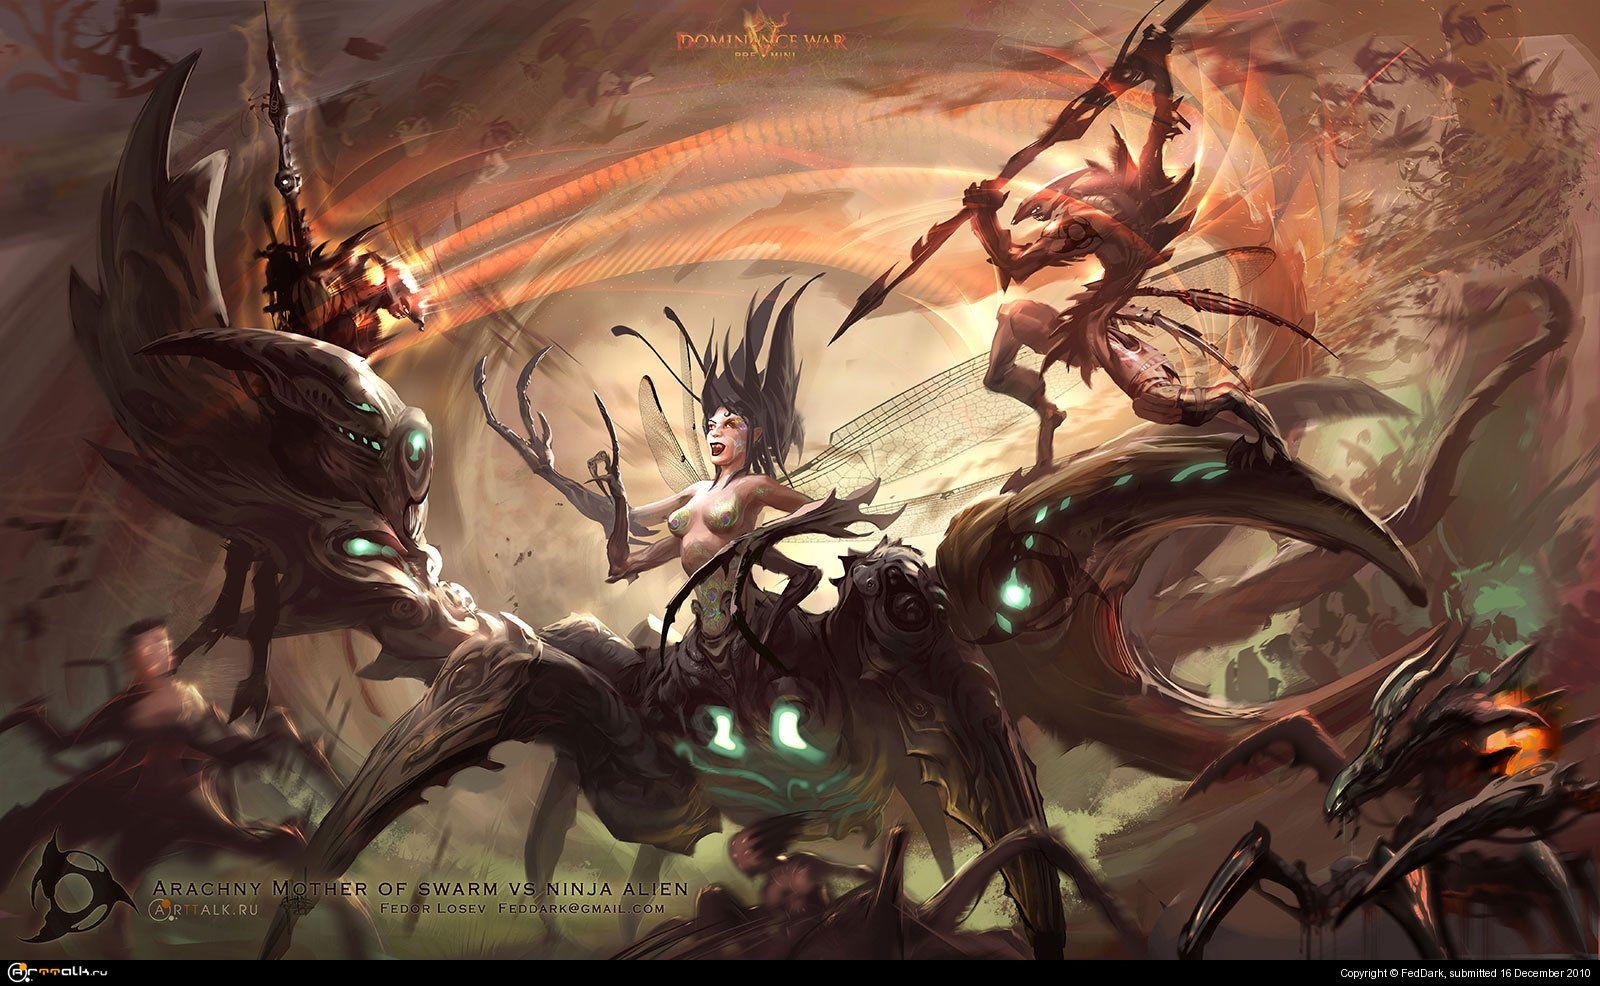 Arachny Mother Of Swarm Vs Ninja Alien